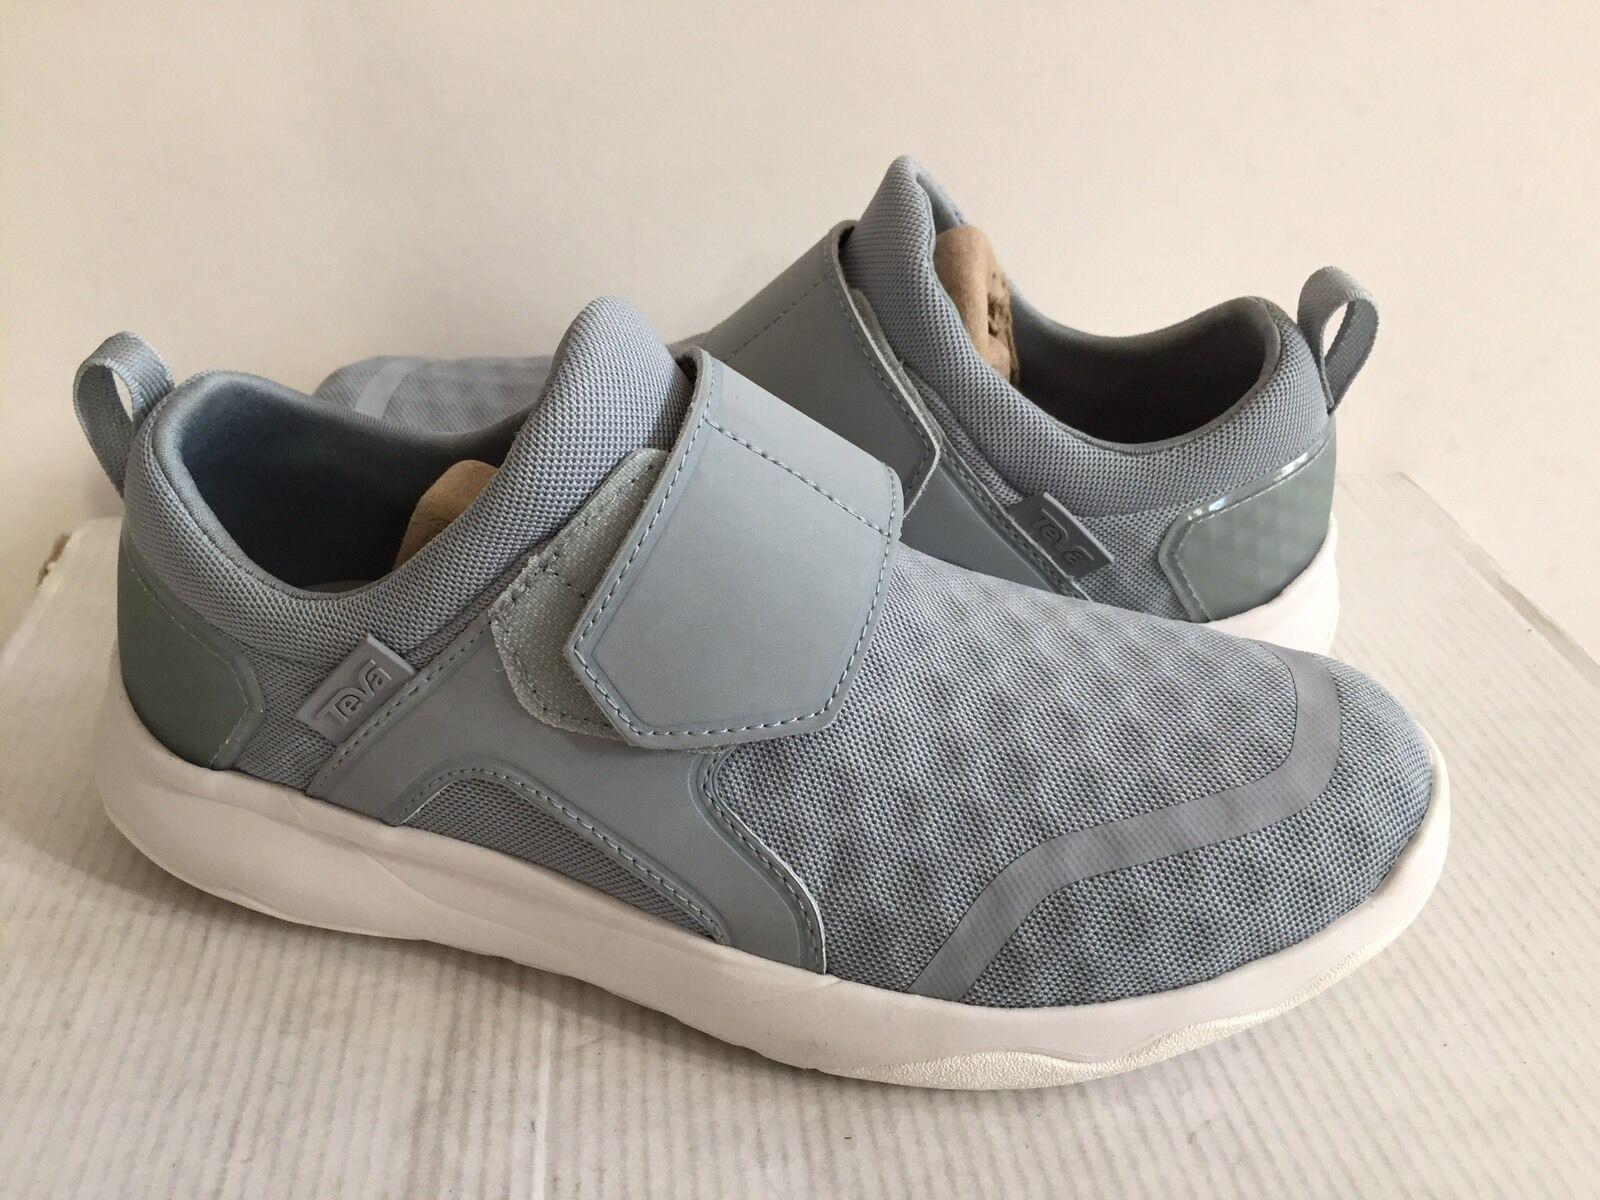 shopping online di moda TEVA donna ARROWOOD ARROWOOD ARROWOOD SWIFT SLIP ON QUARRY grigio scarpe US 7.5   EU 38.5    l'intera rete più bassa